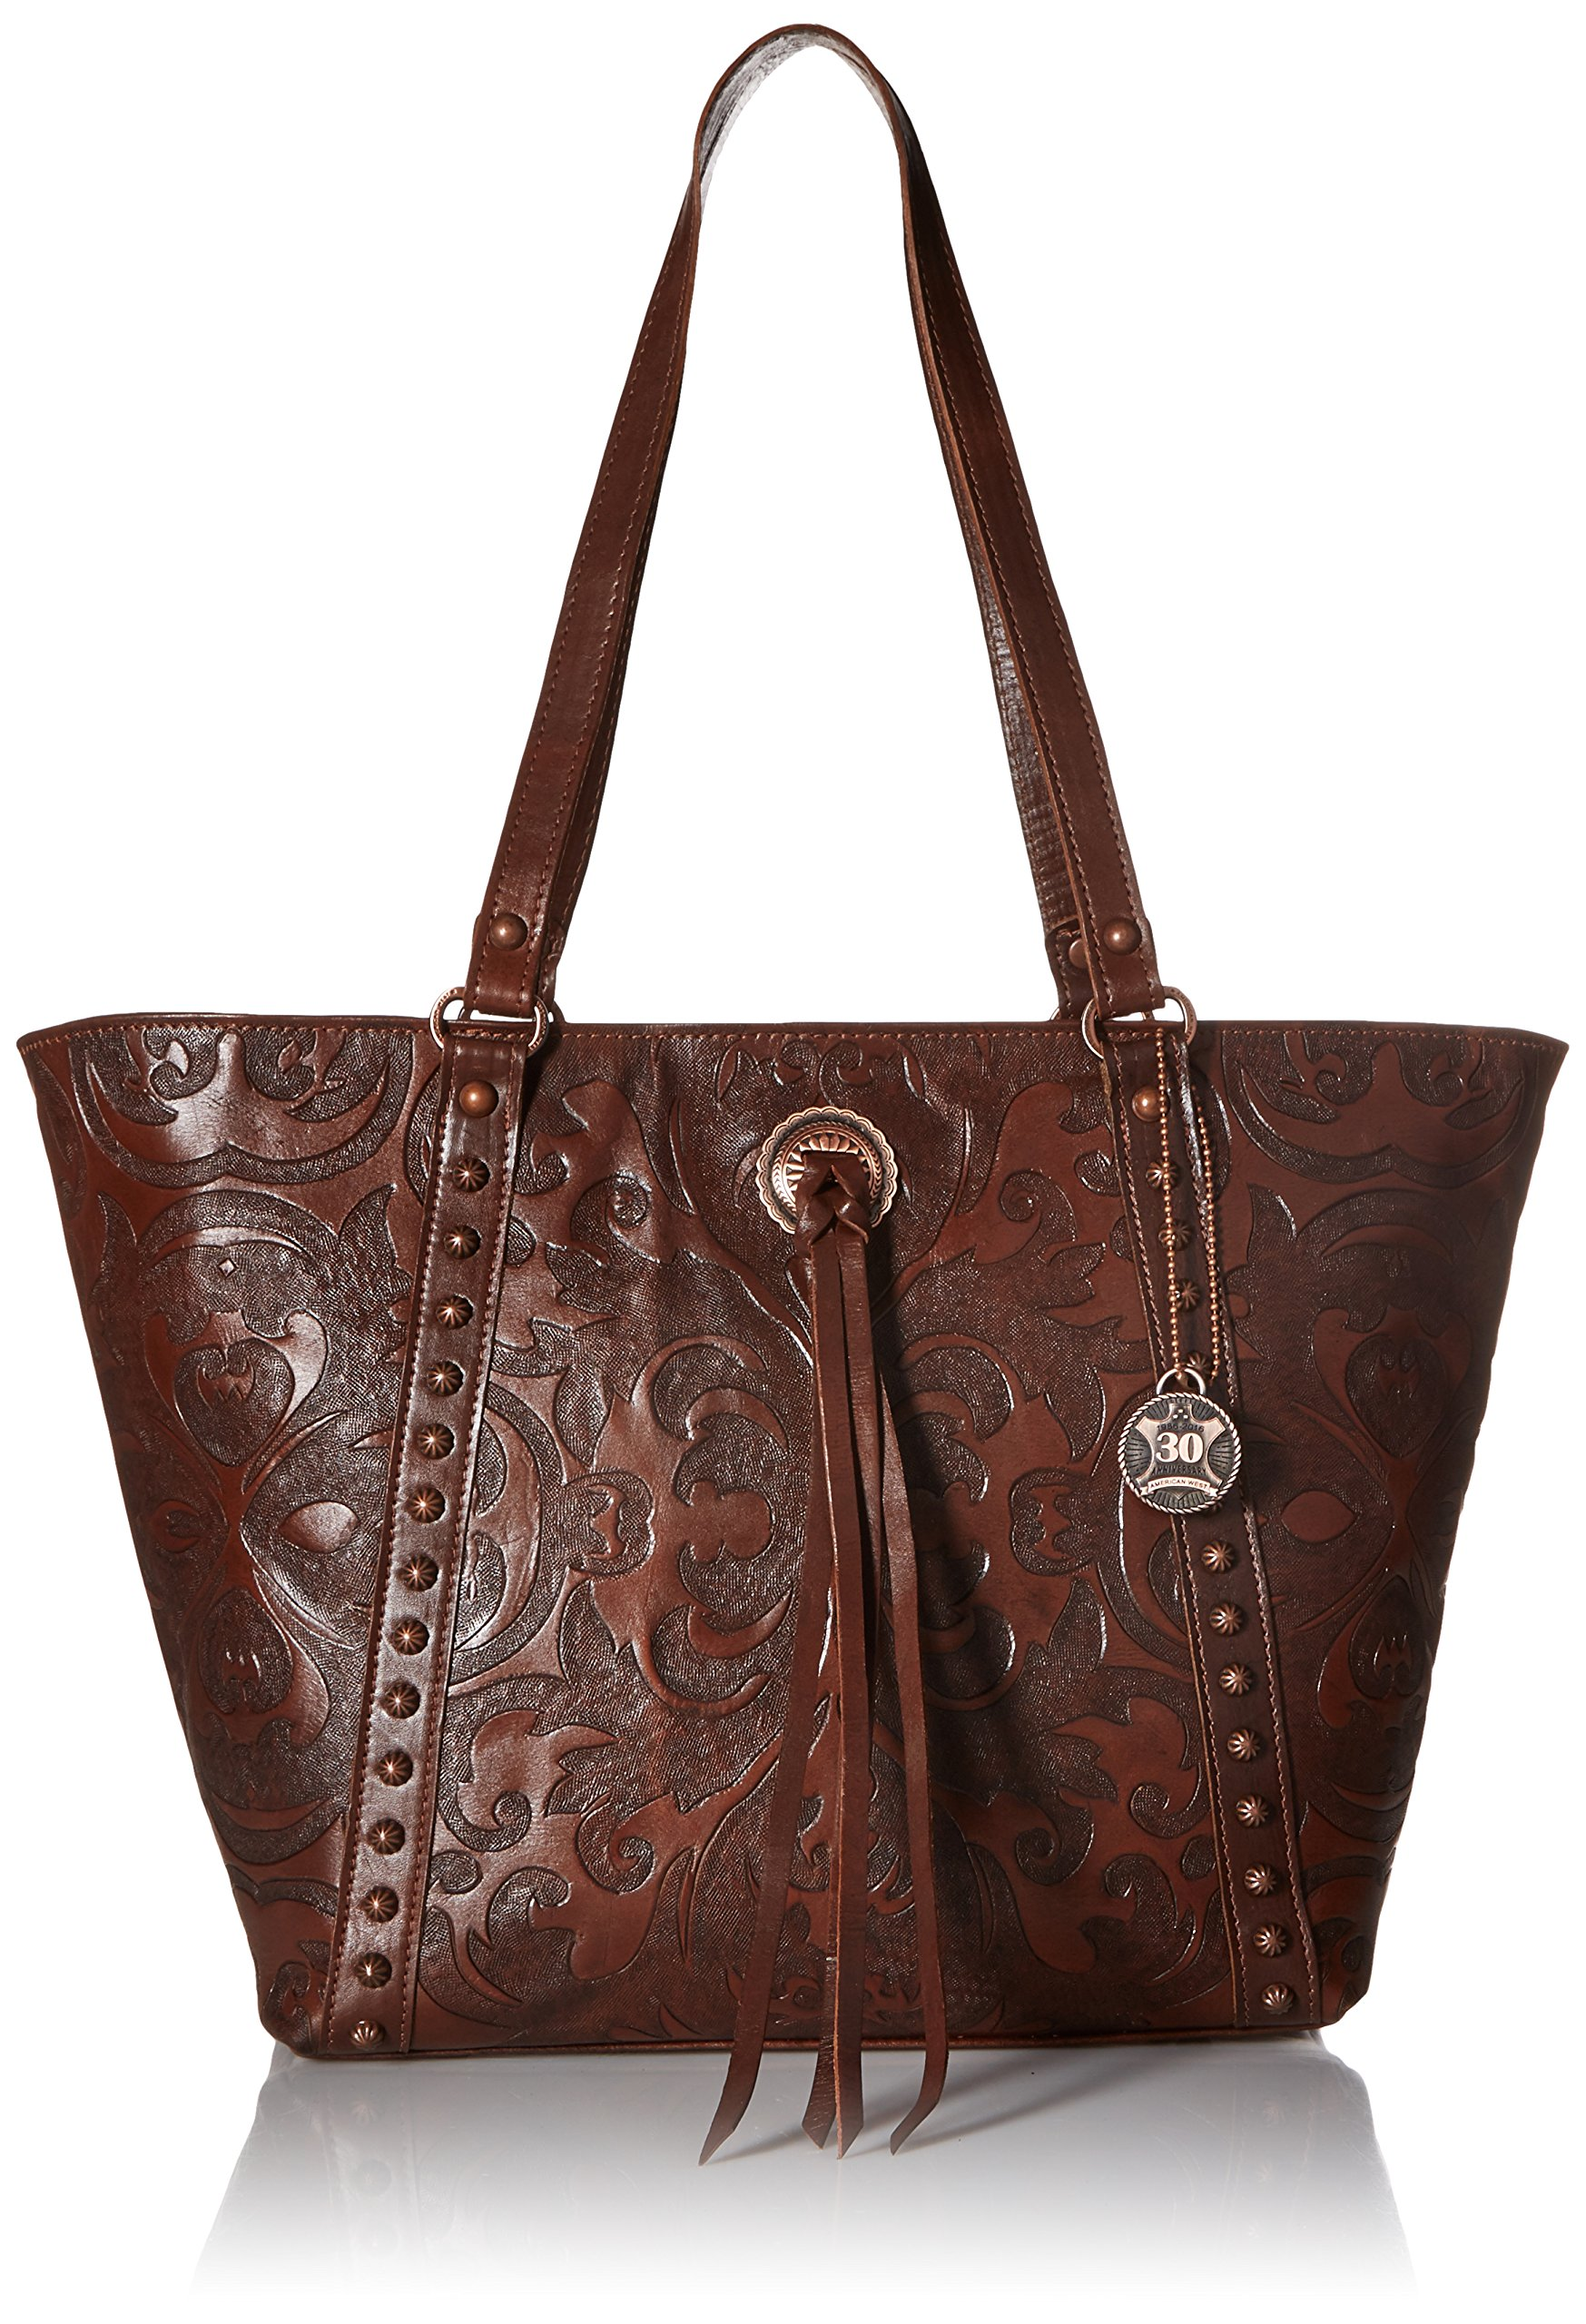 American West Baroque Zip Top Bucket Tote, Chestnut Brown by American West